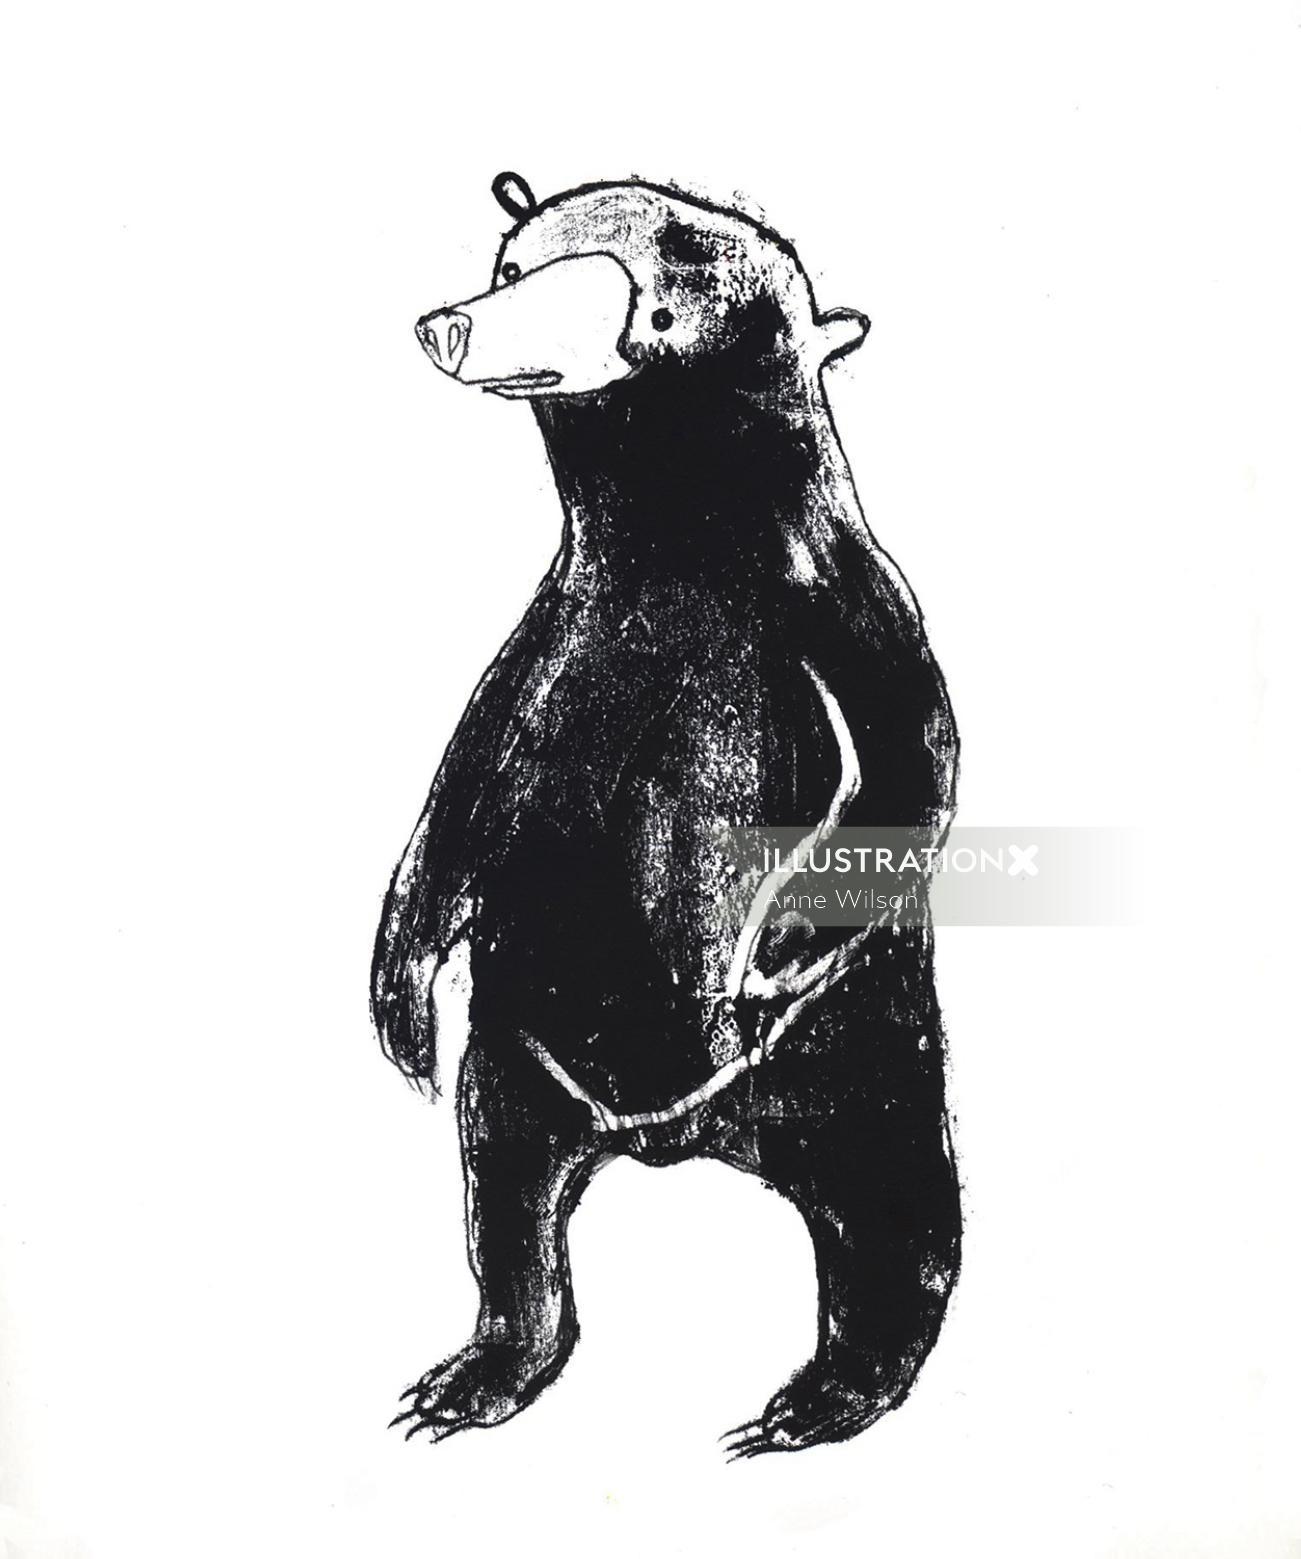 An illustration of Fuzzy Bear